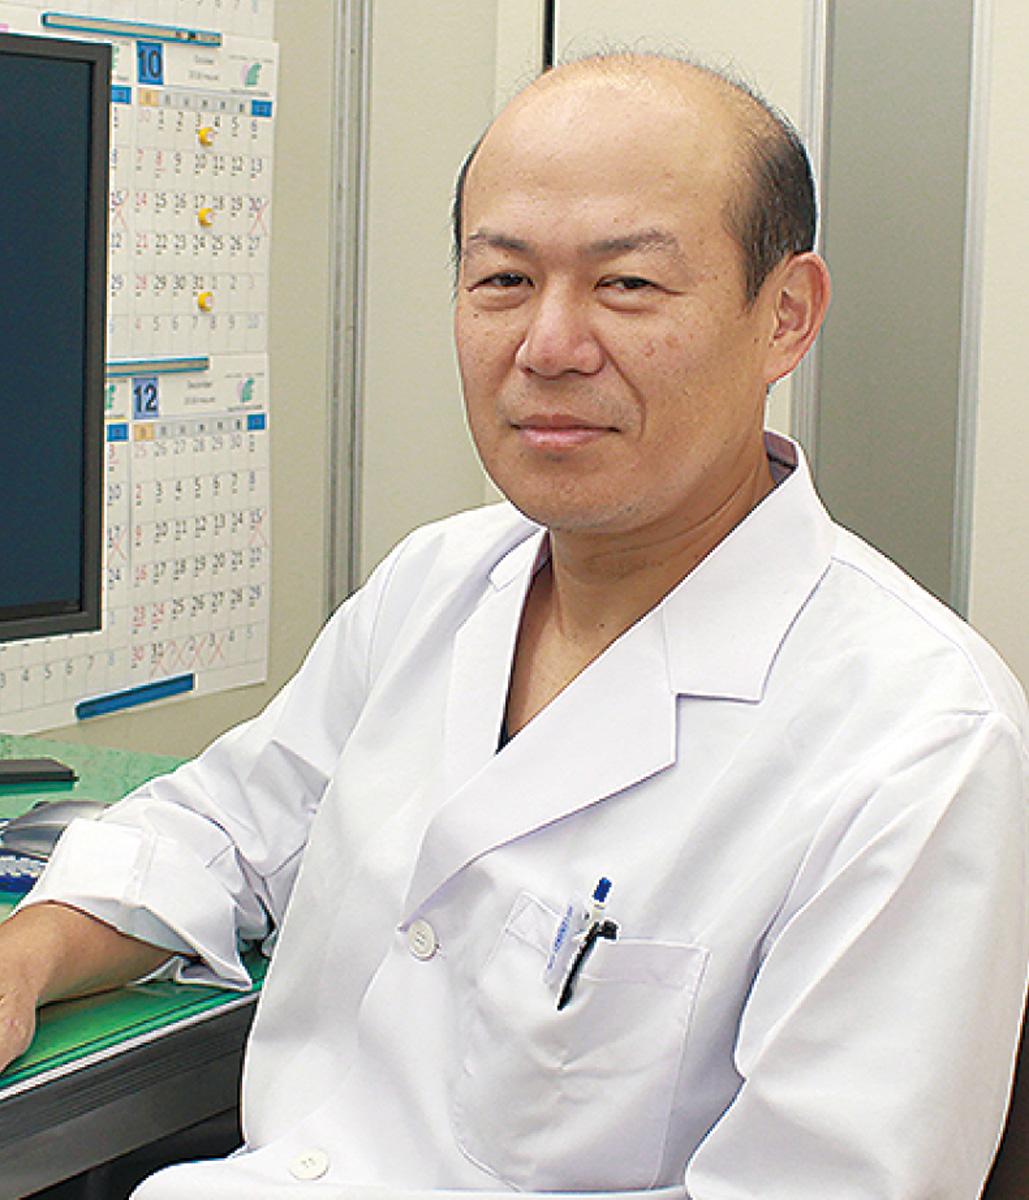 QOLの維持・向上目指す大腸がん治療